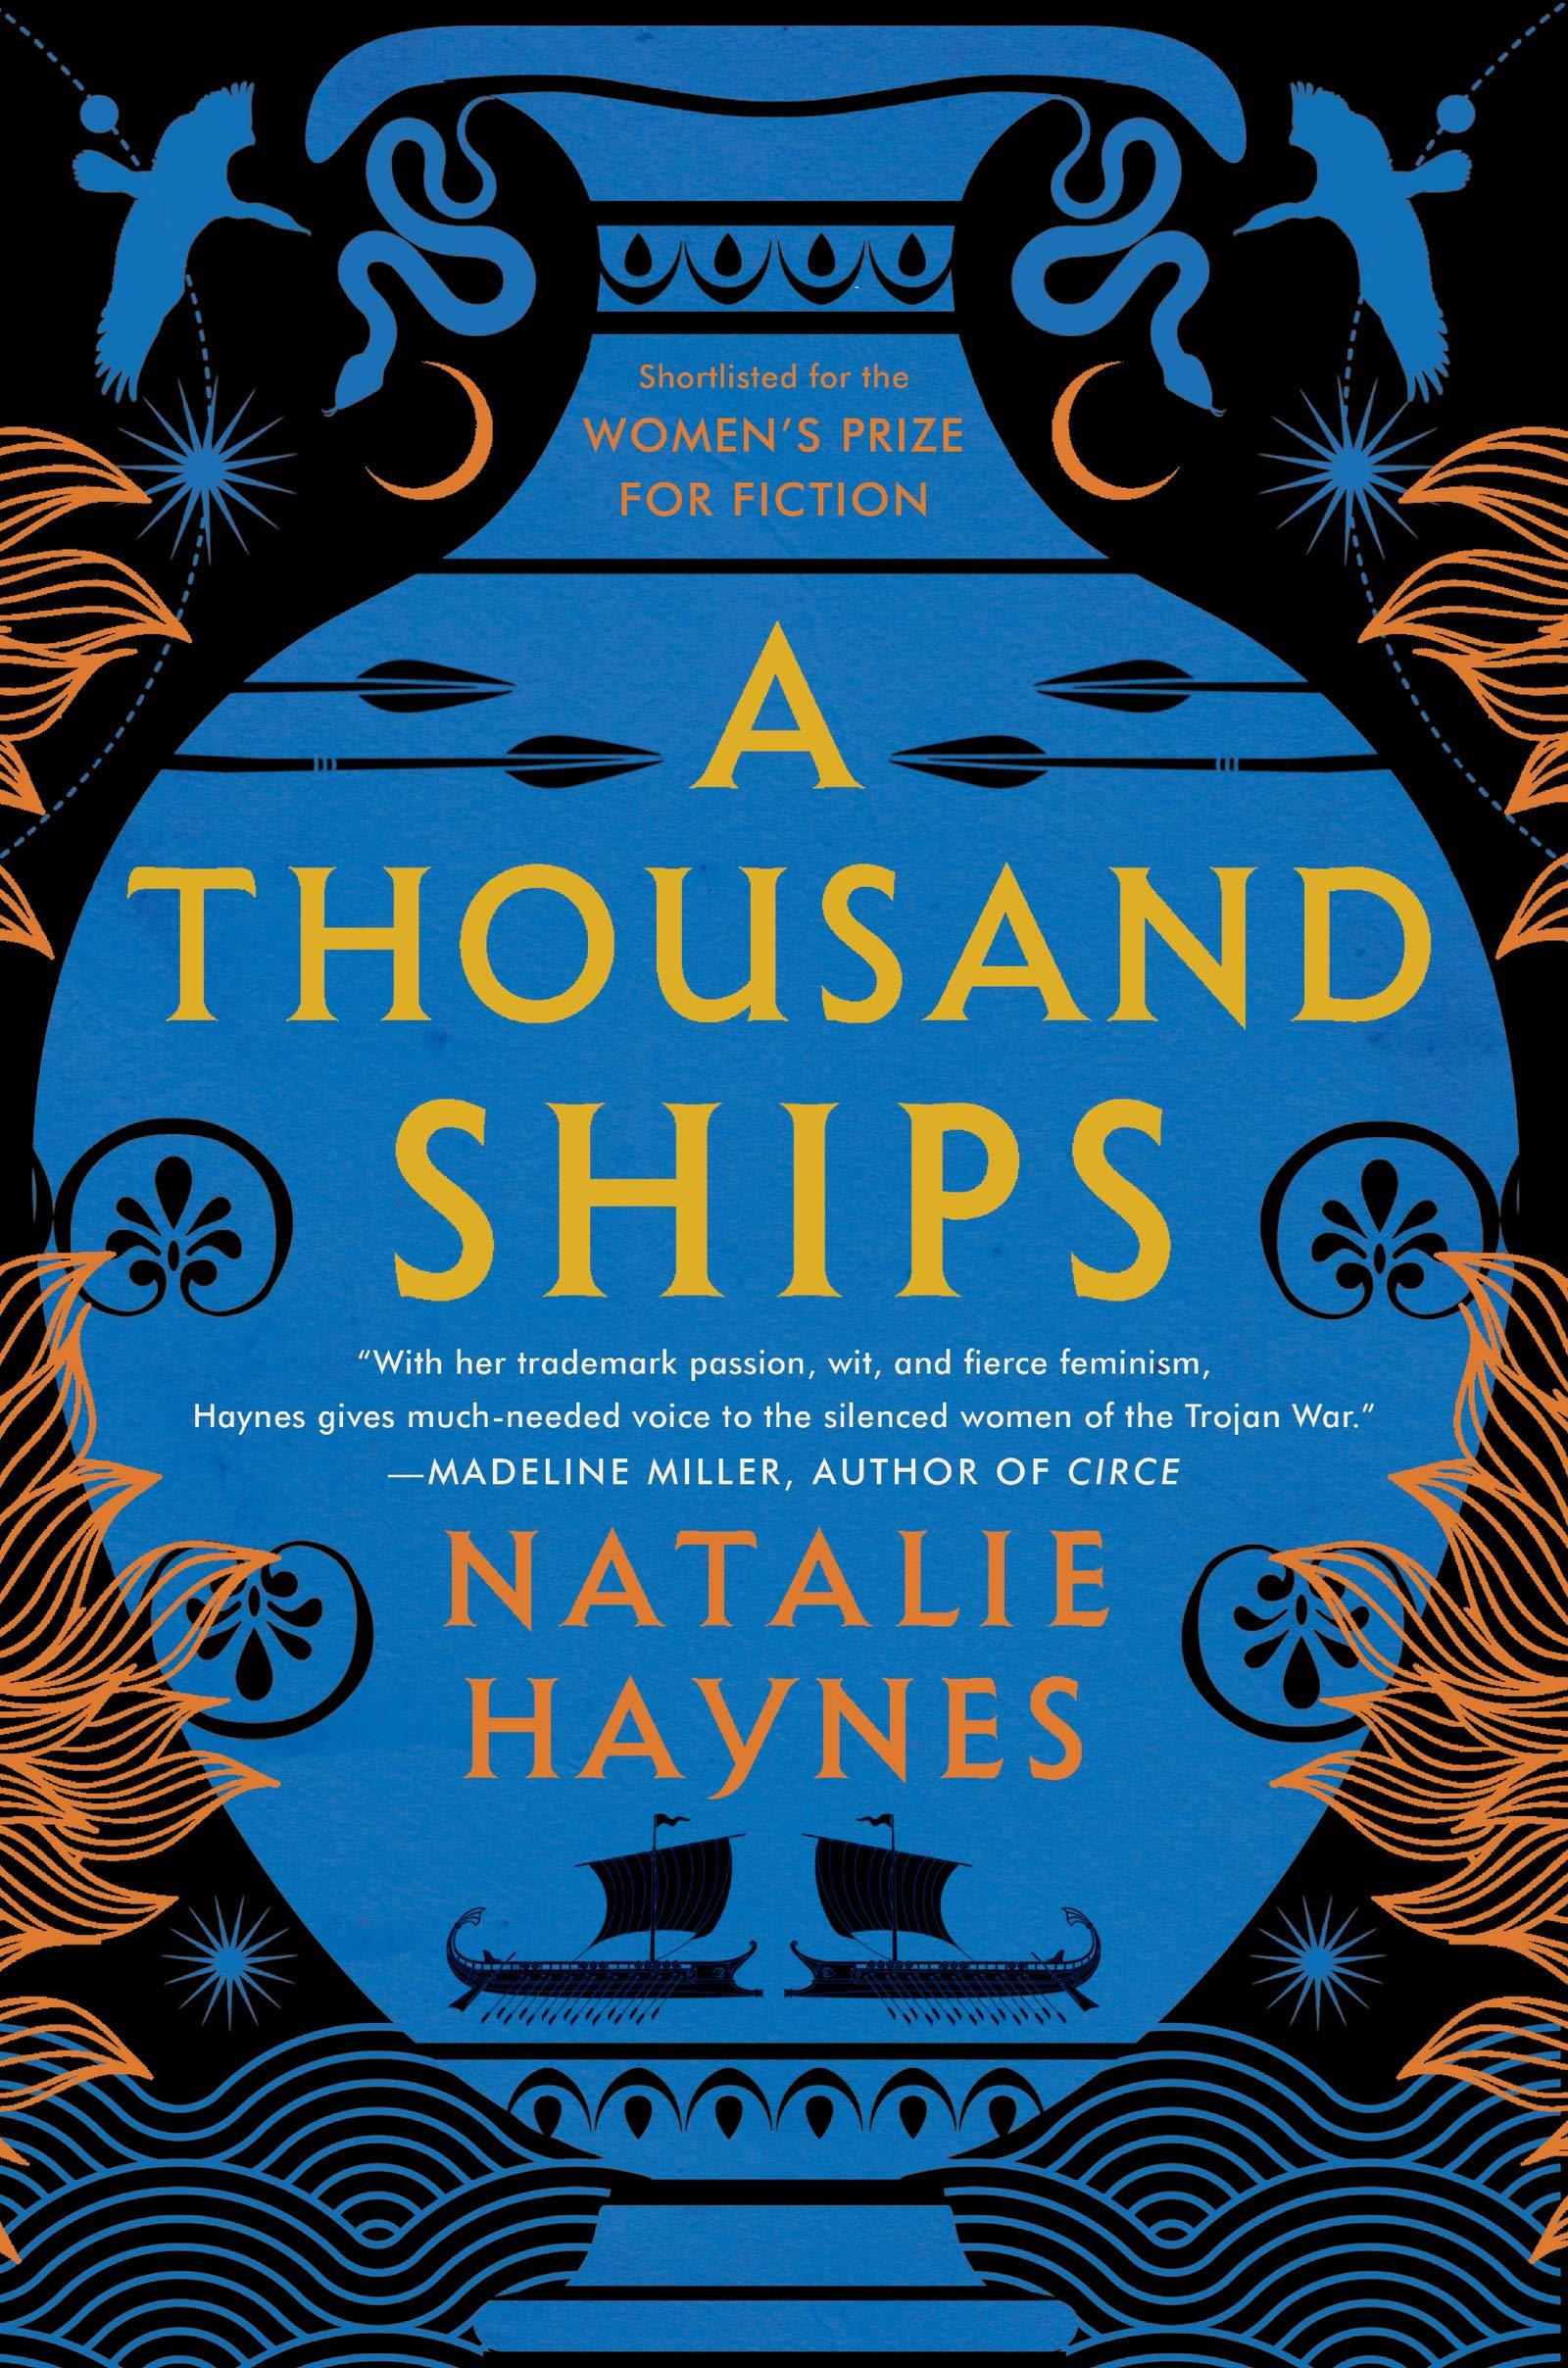 Amazon.com: A Thousand Ships: A Novel (9780063065390): Haynes, Natalie:  Books